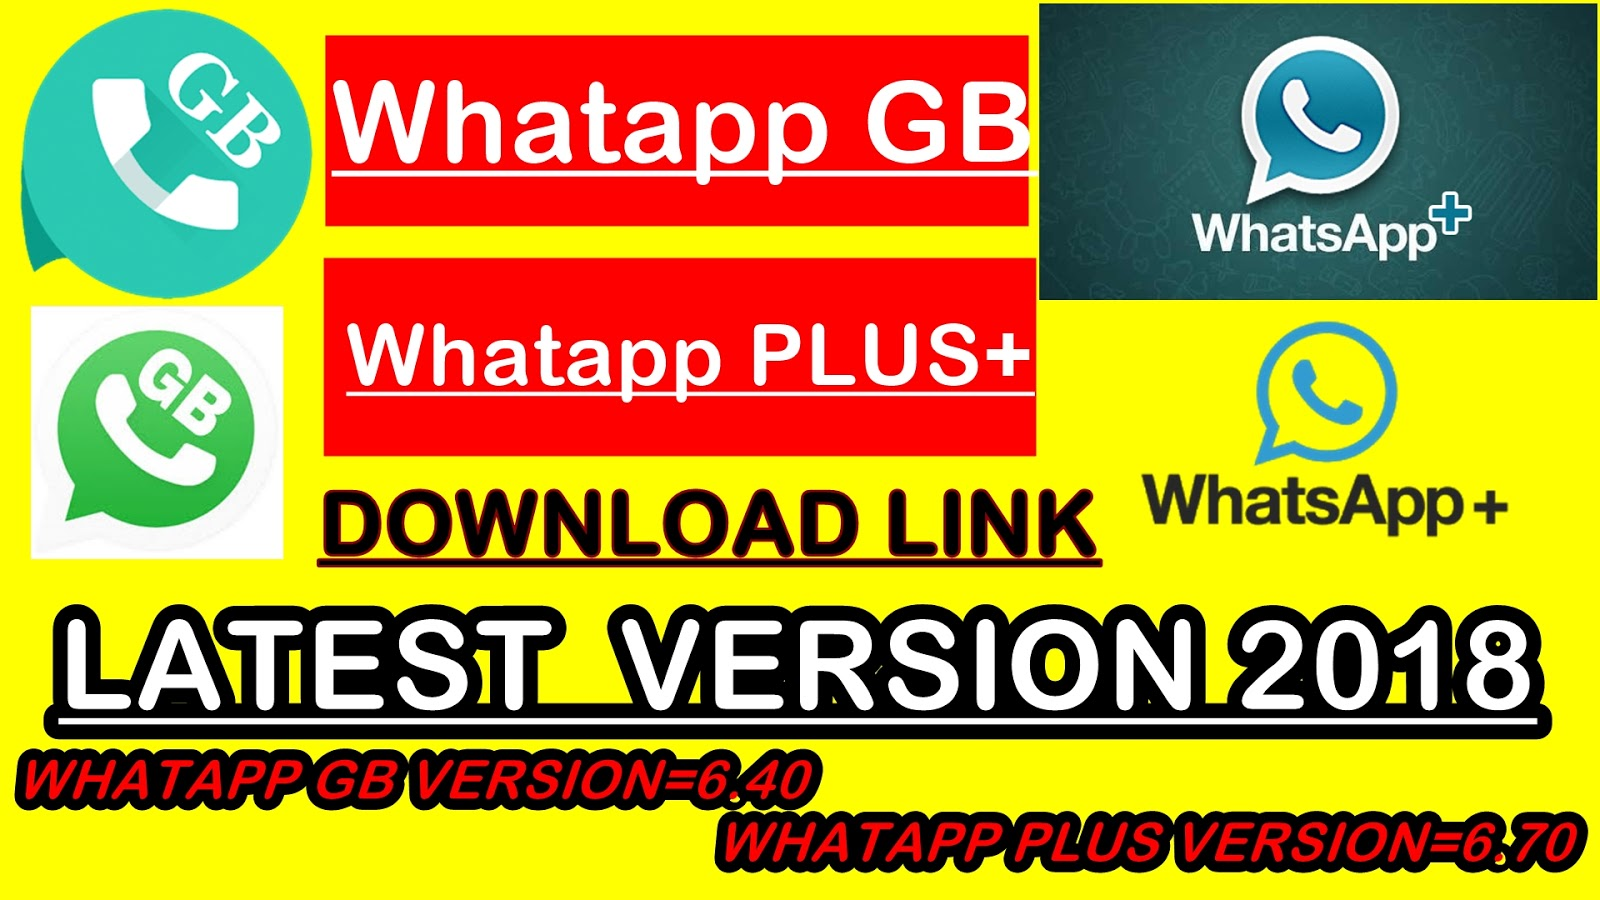 Gbwhatsapp 6 40 download